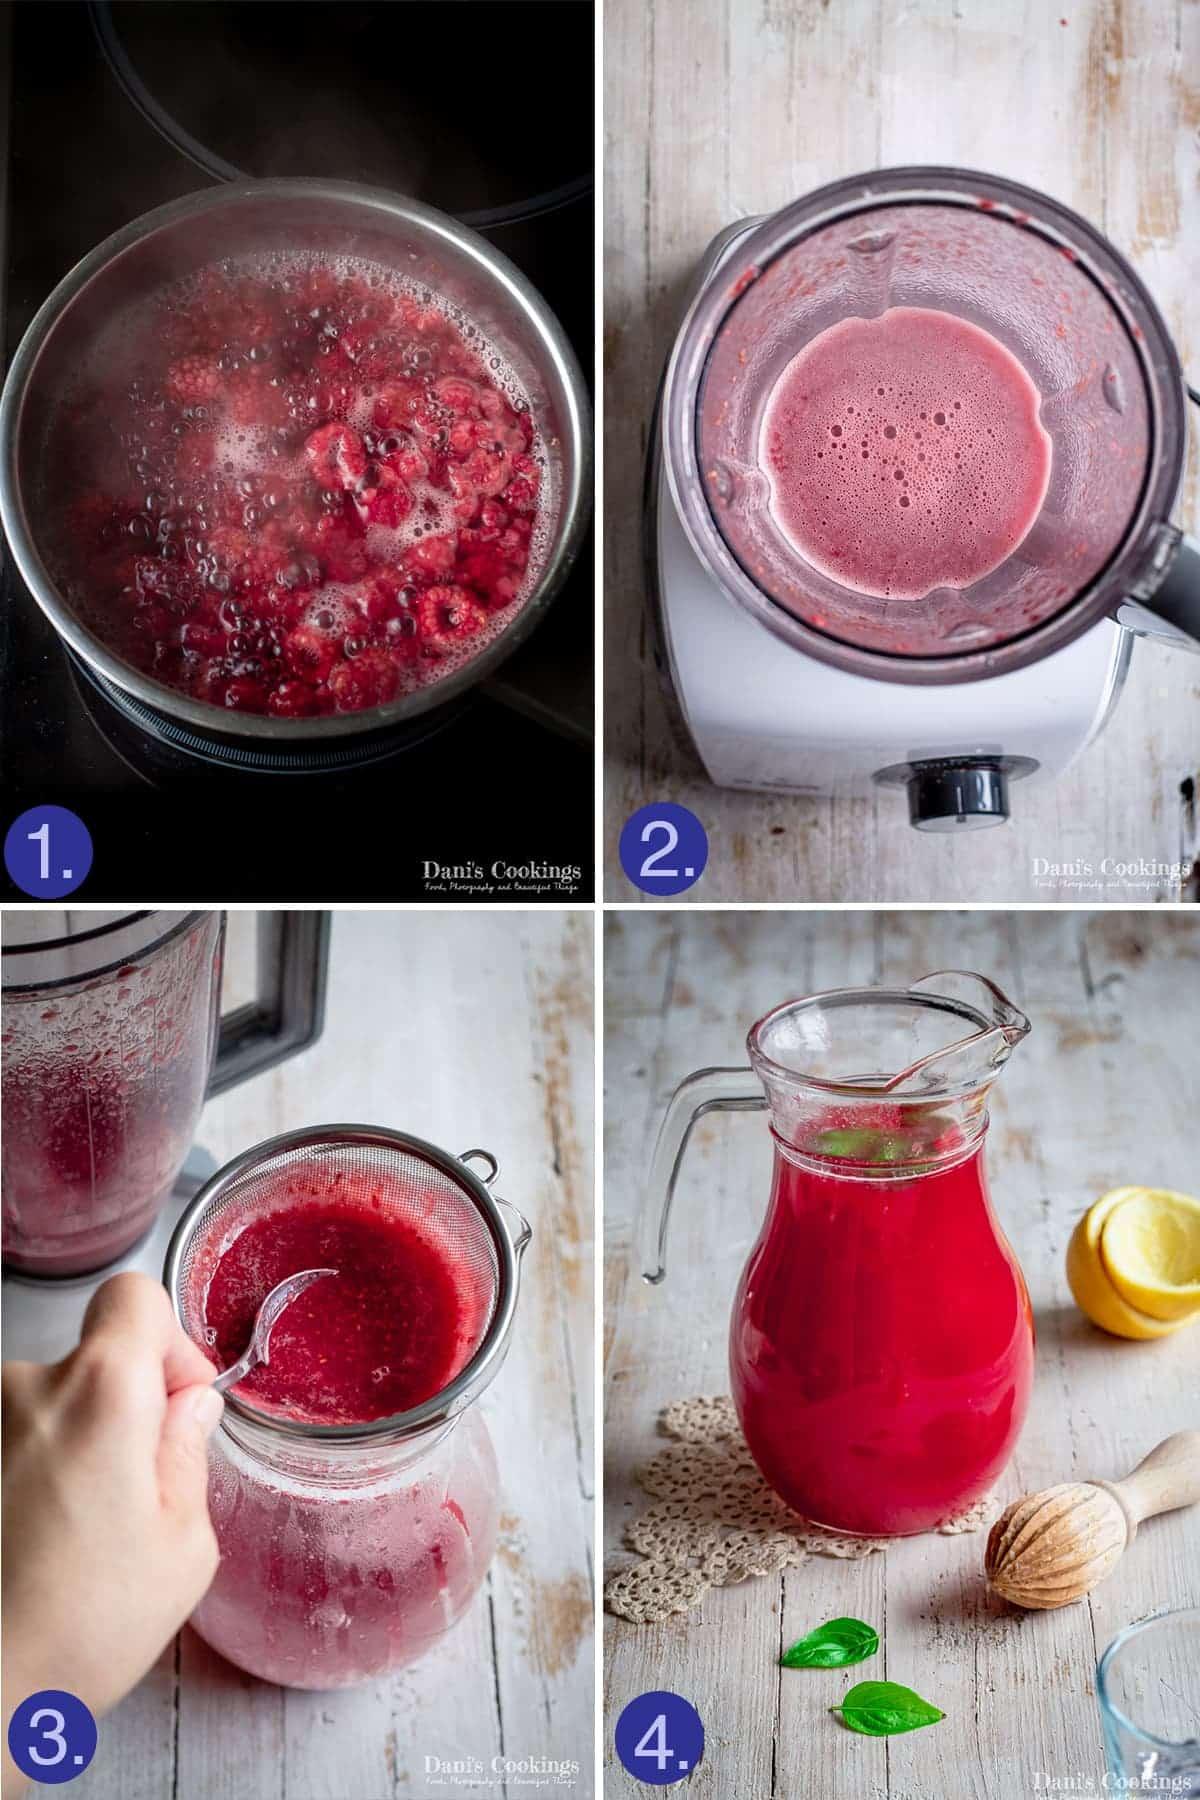 steps to make the raspberry lemonade